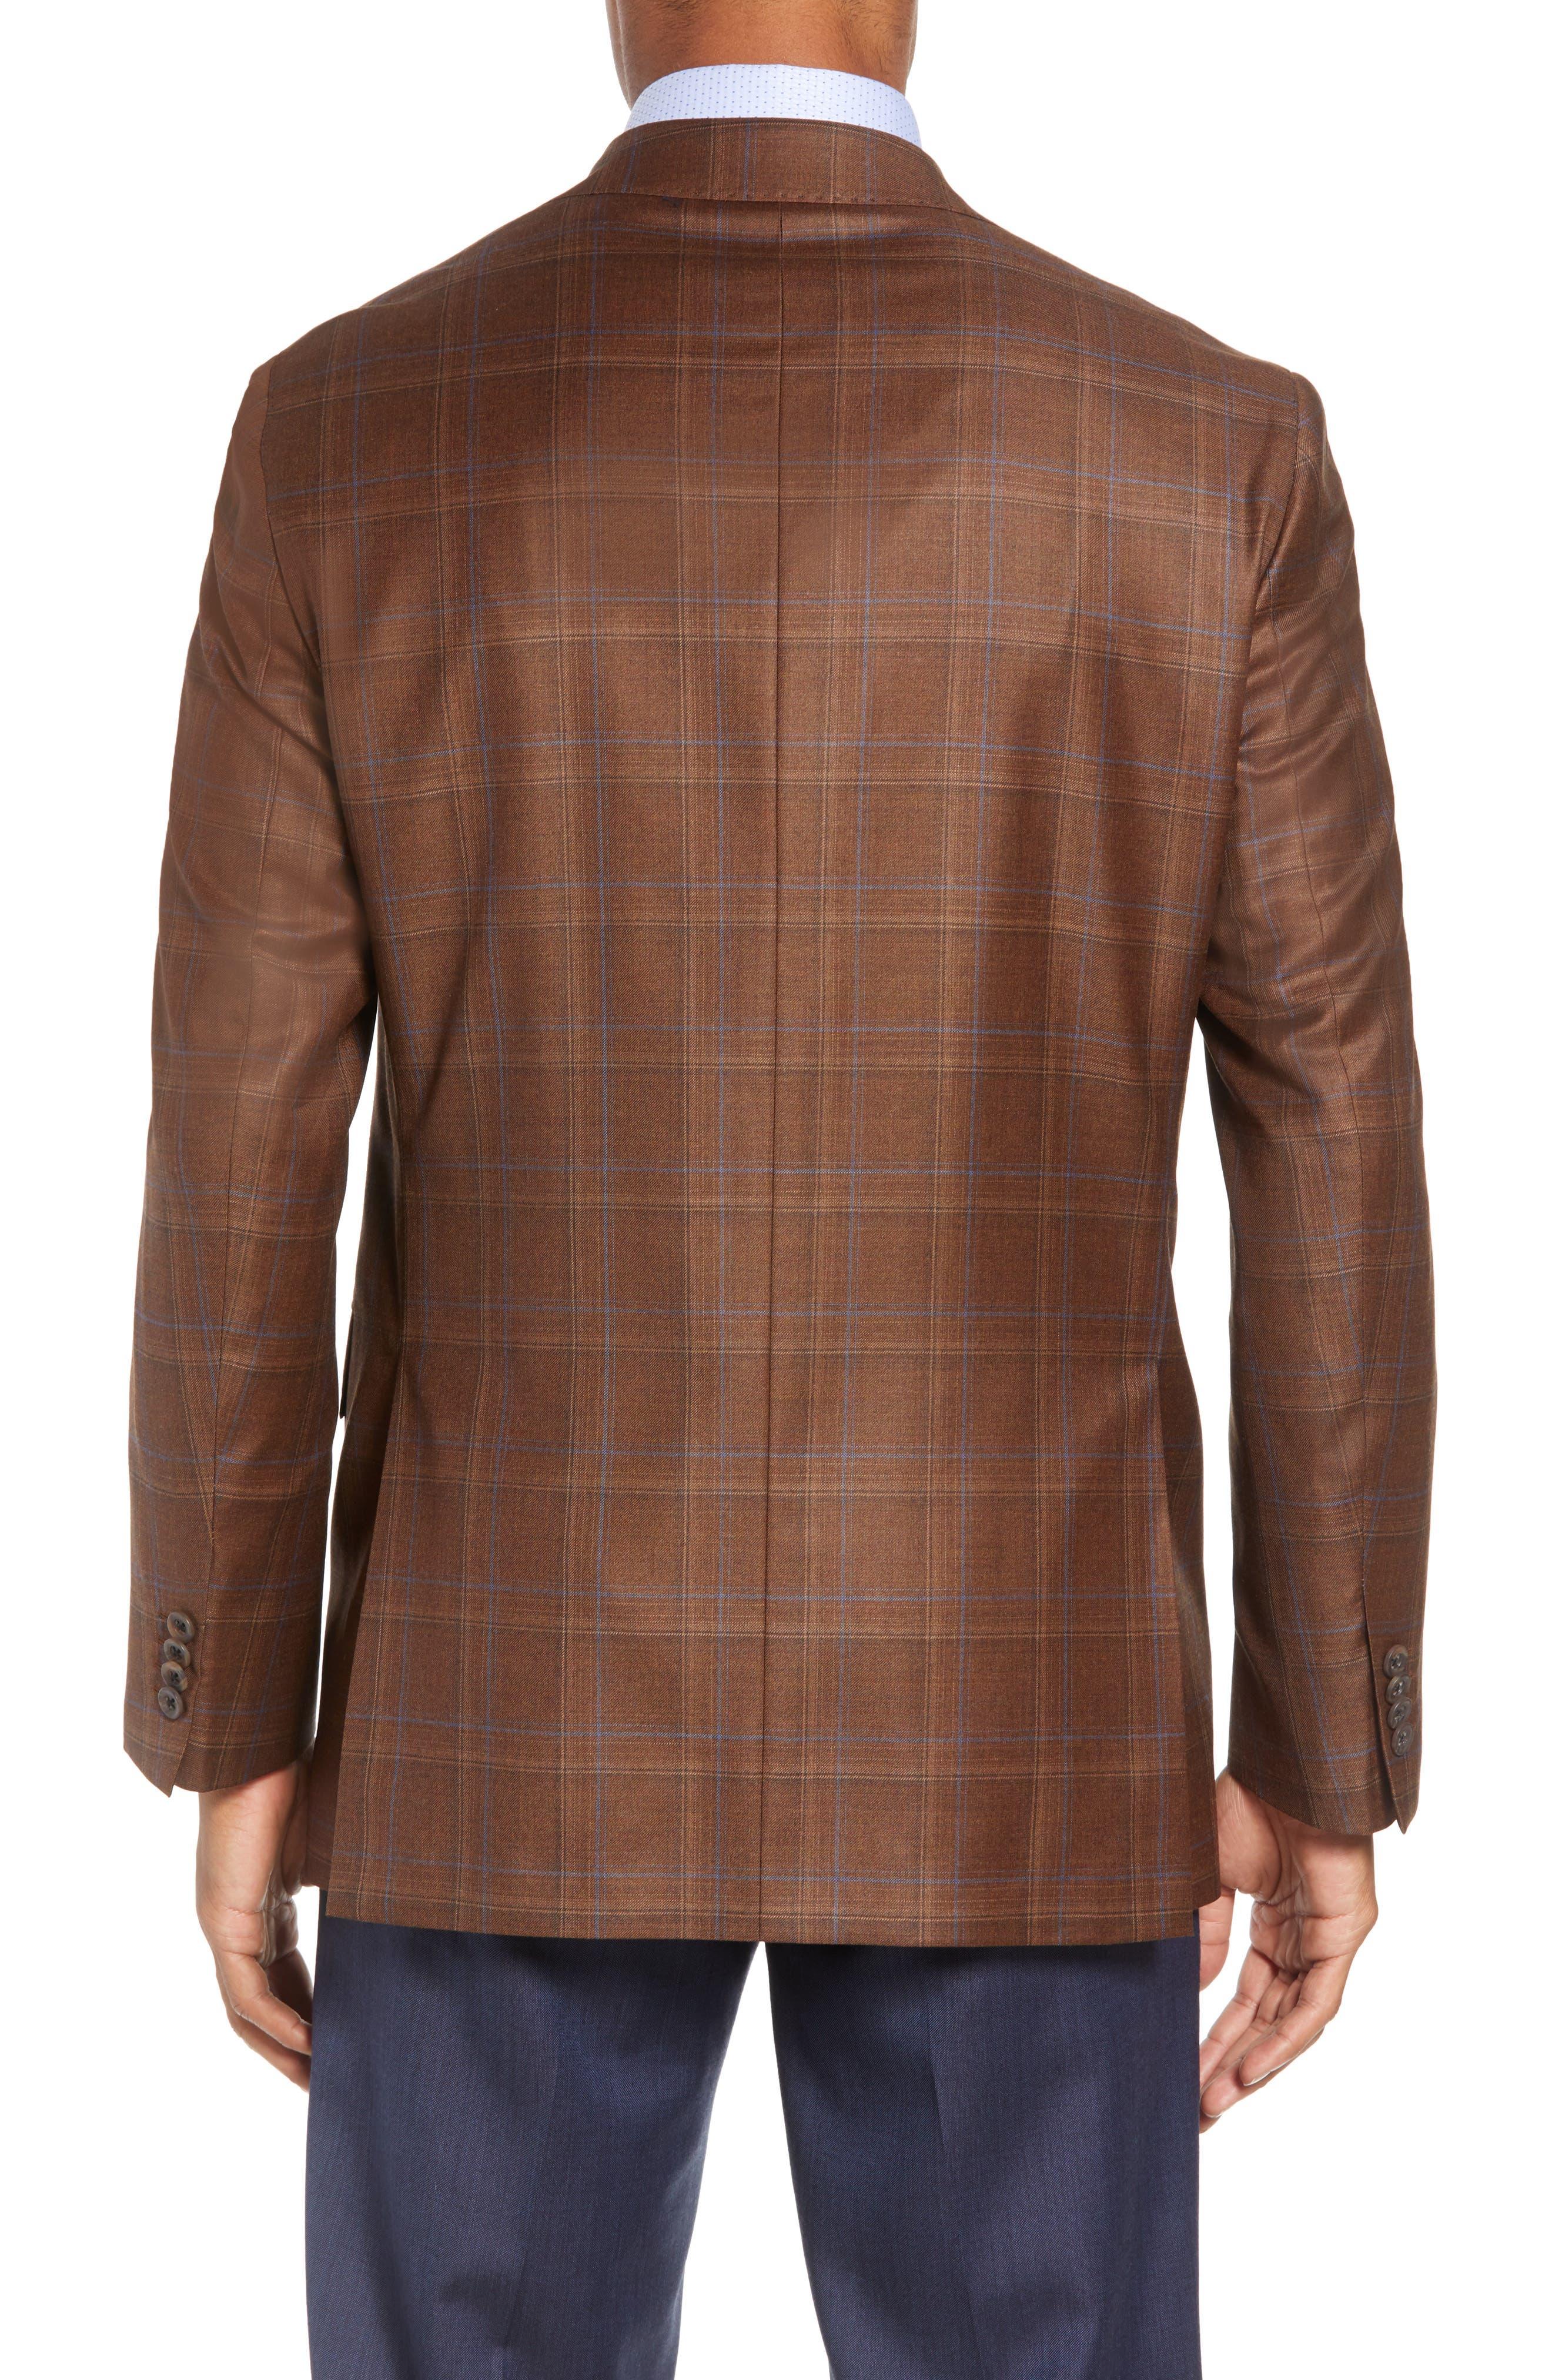 Arnold Classic Fit Plaid Wool Sport Coat,                             Alternate thumbnail 2, color,                             200